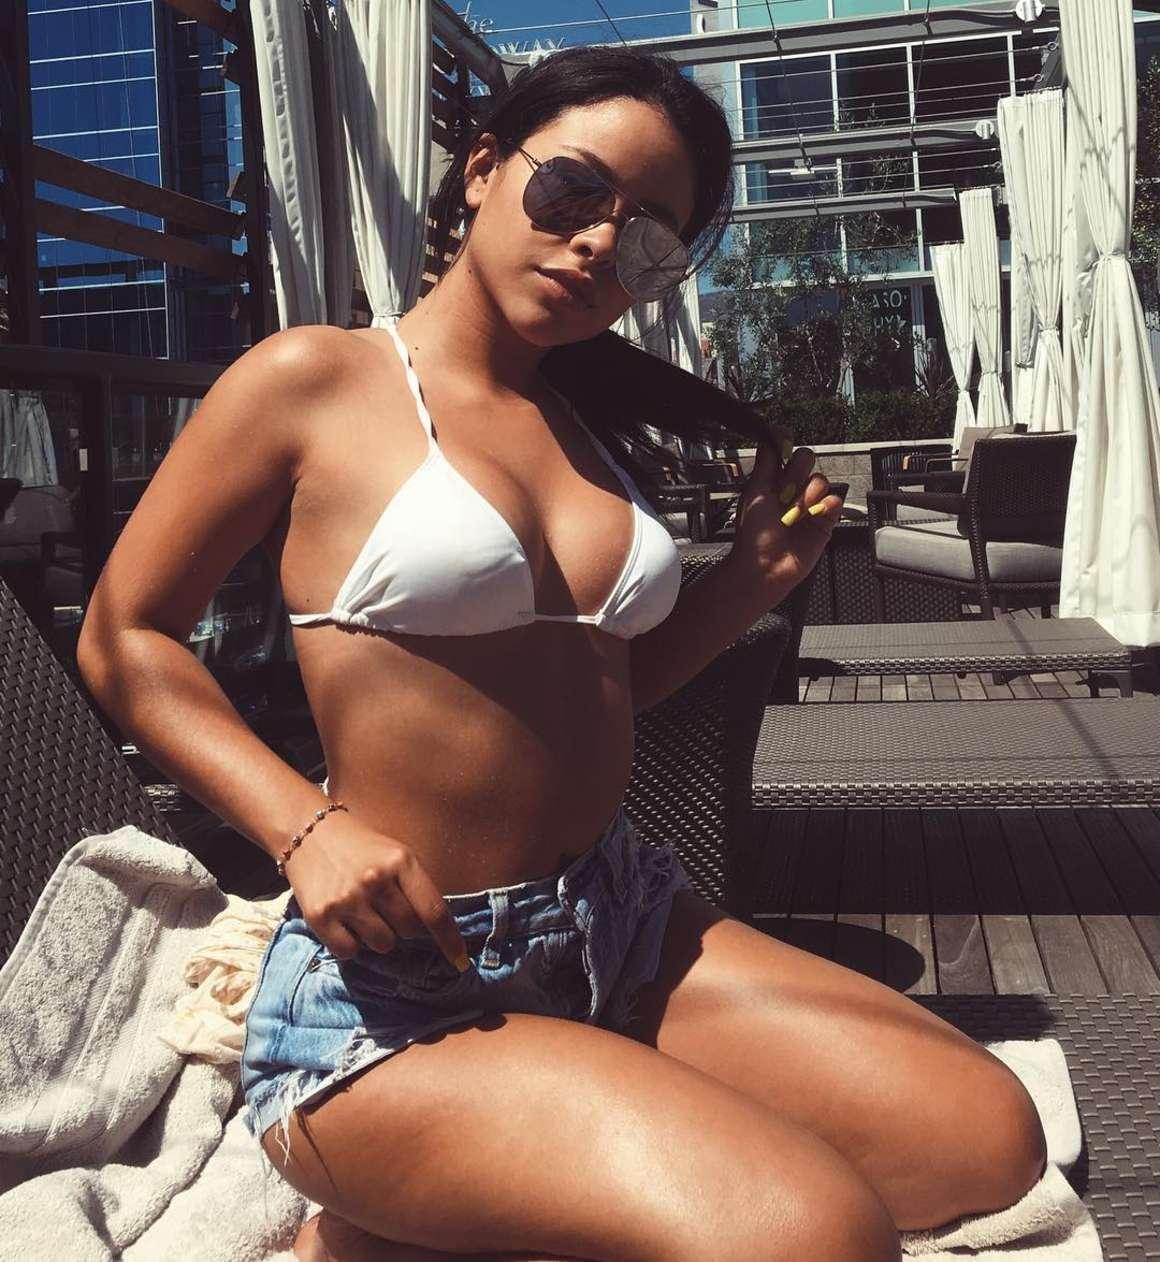 Bikini Cierra Ramirez nude (46 photos), Tits, Leaked, Selfie, butt 2015